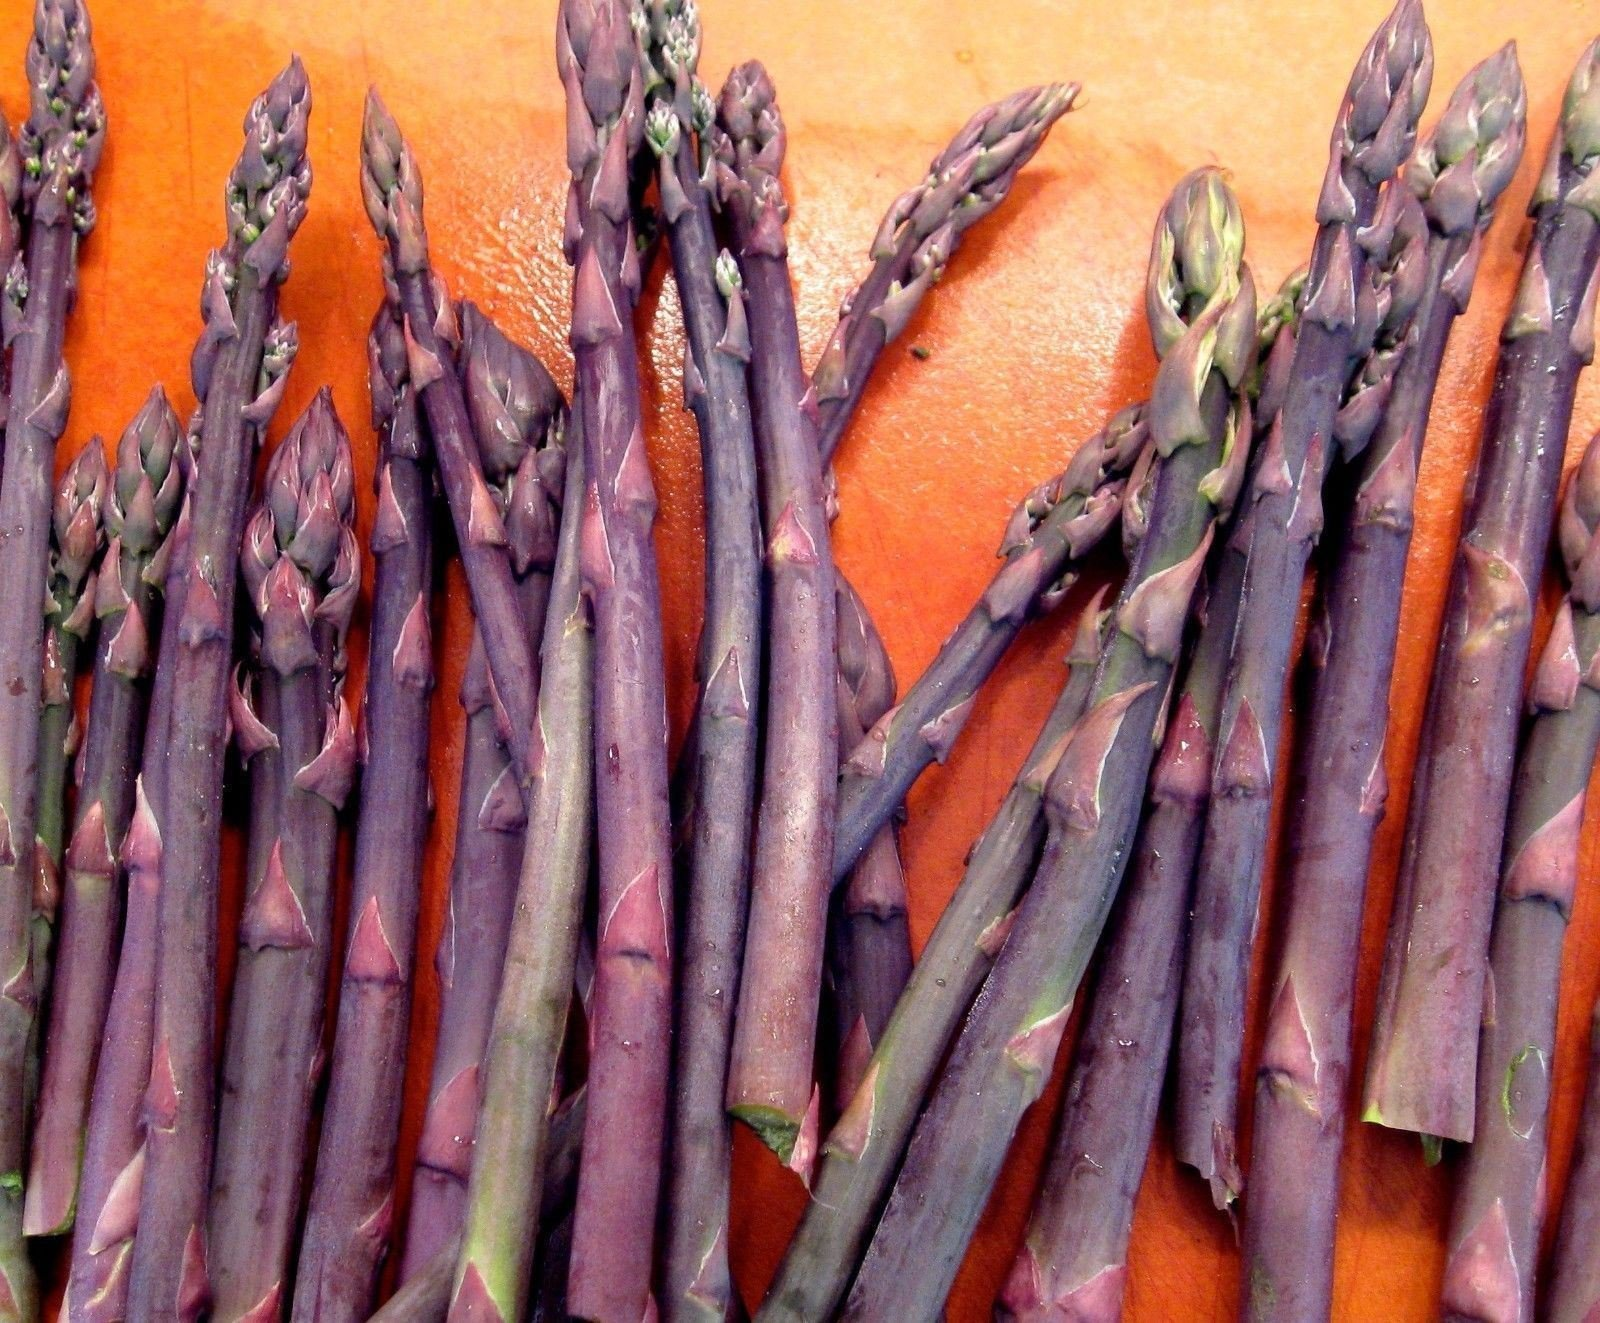 20 Asparagus Crown - Asparagus - Purple Passion 2 Year Roots